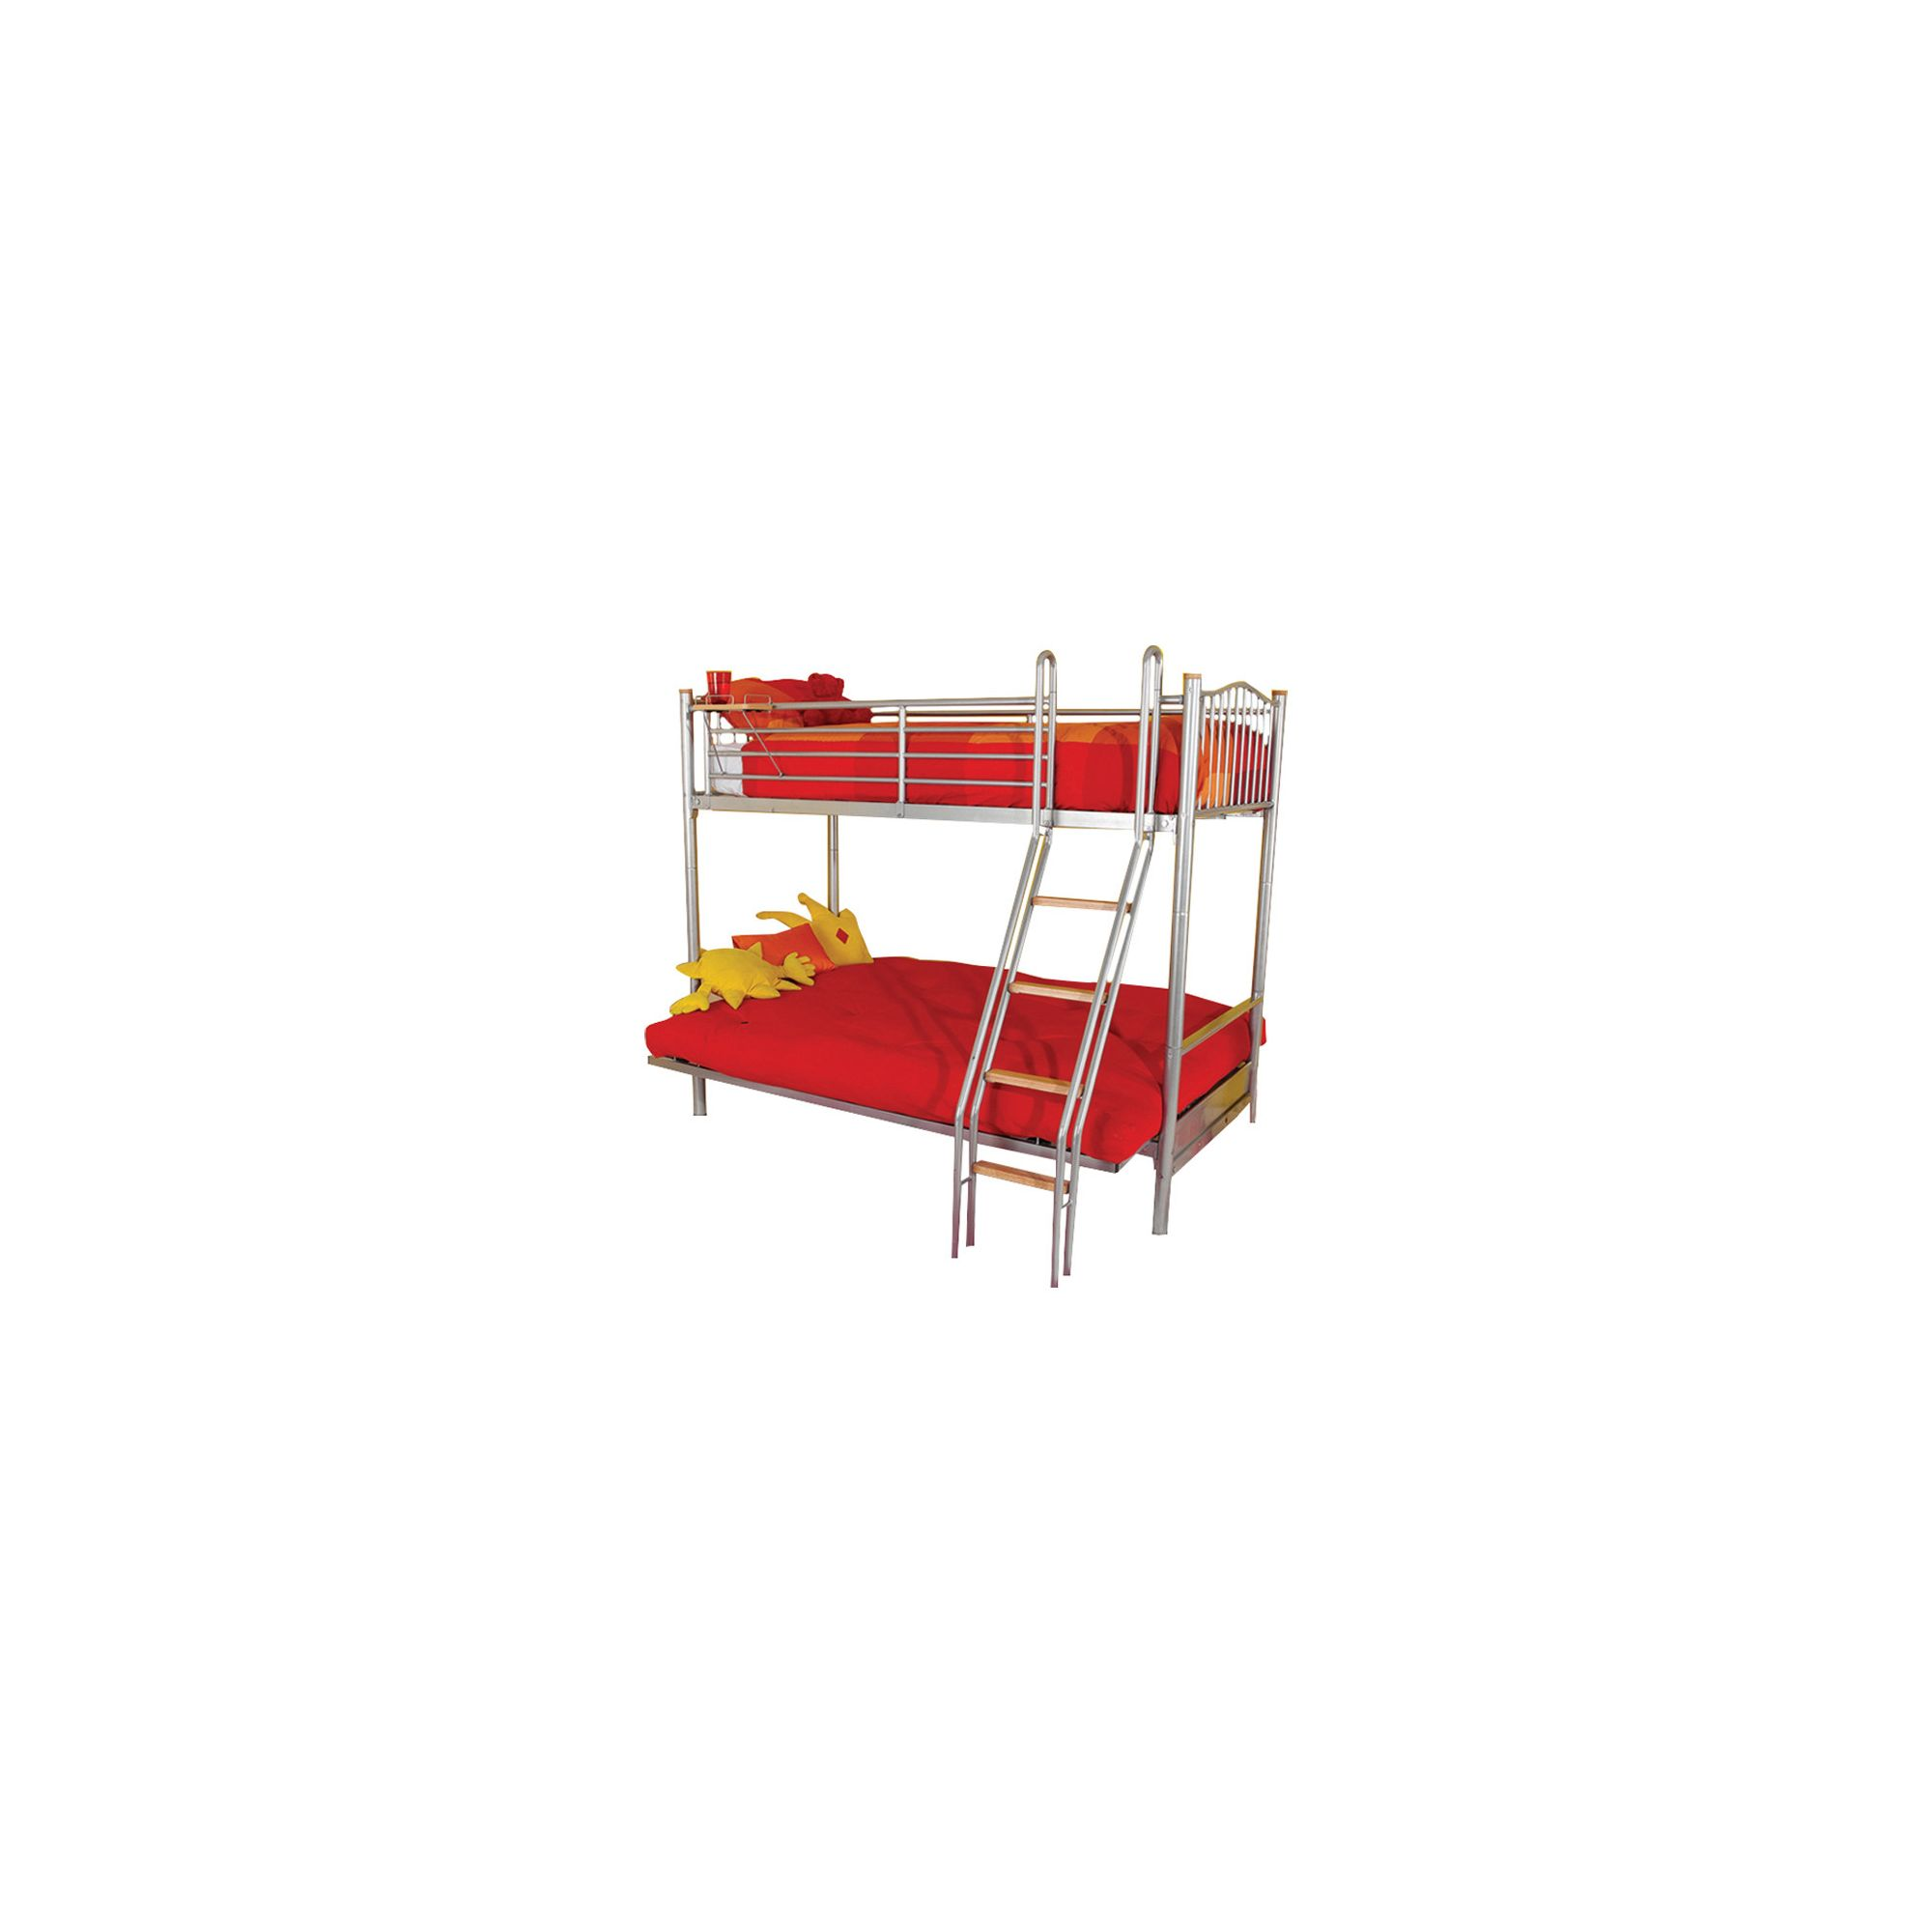 Hyder Alaska Futon Bunk Bed - Aqua at Tesco Direct